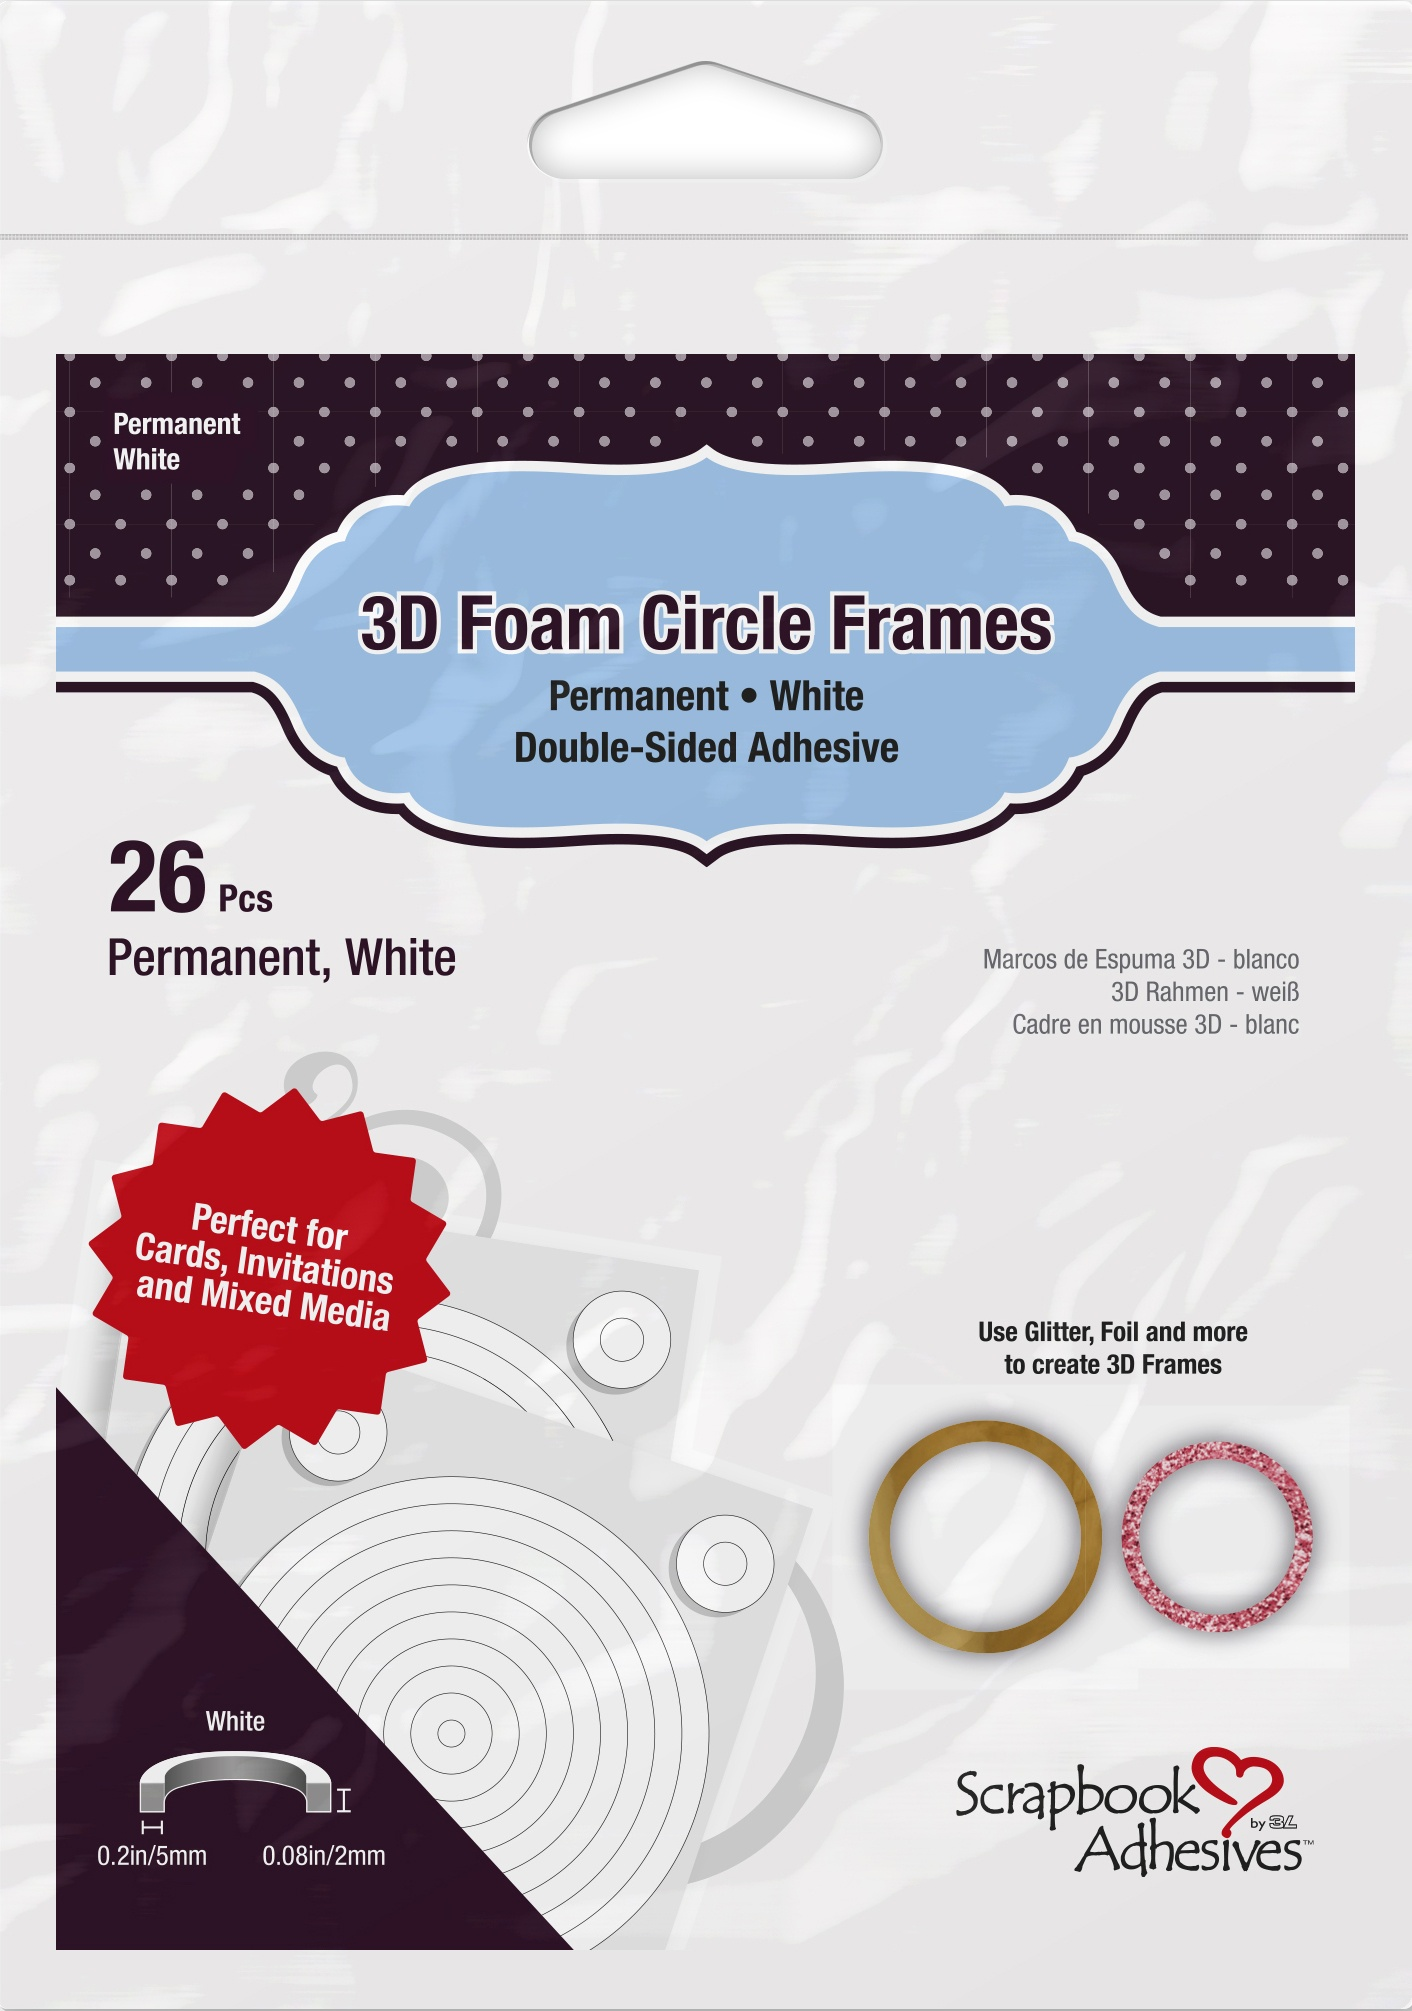 Scrapbook Adhesives 3D Foam Circle Frames 26/Pkg-Permanent, White, .08